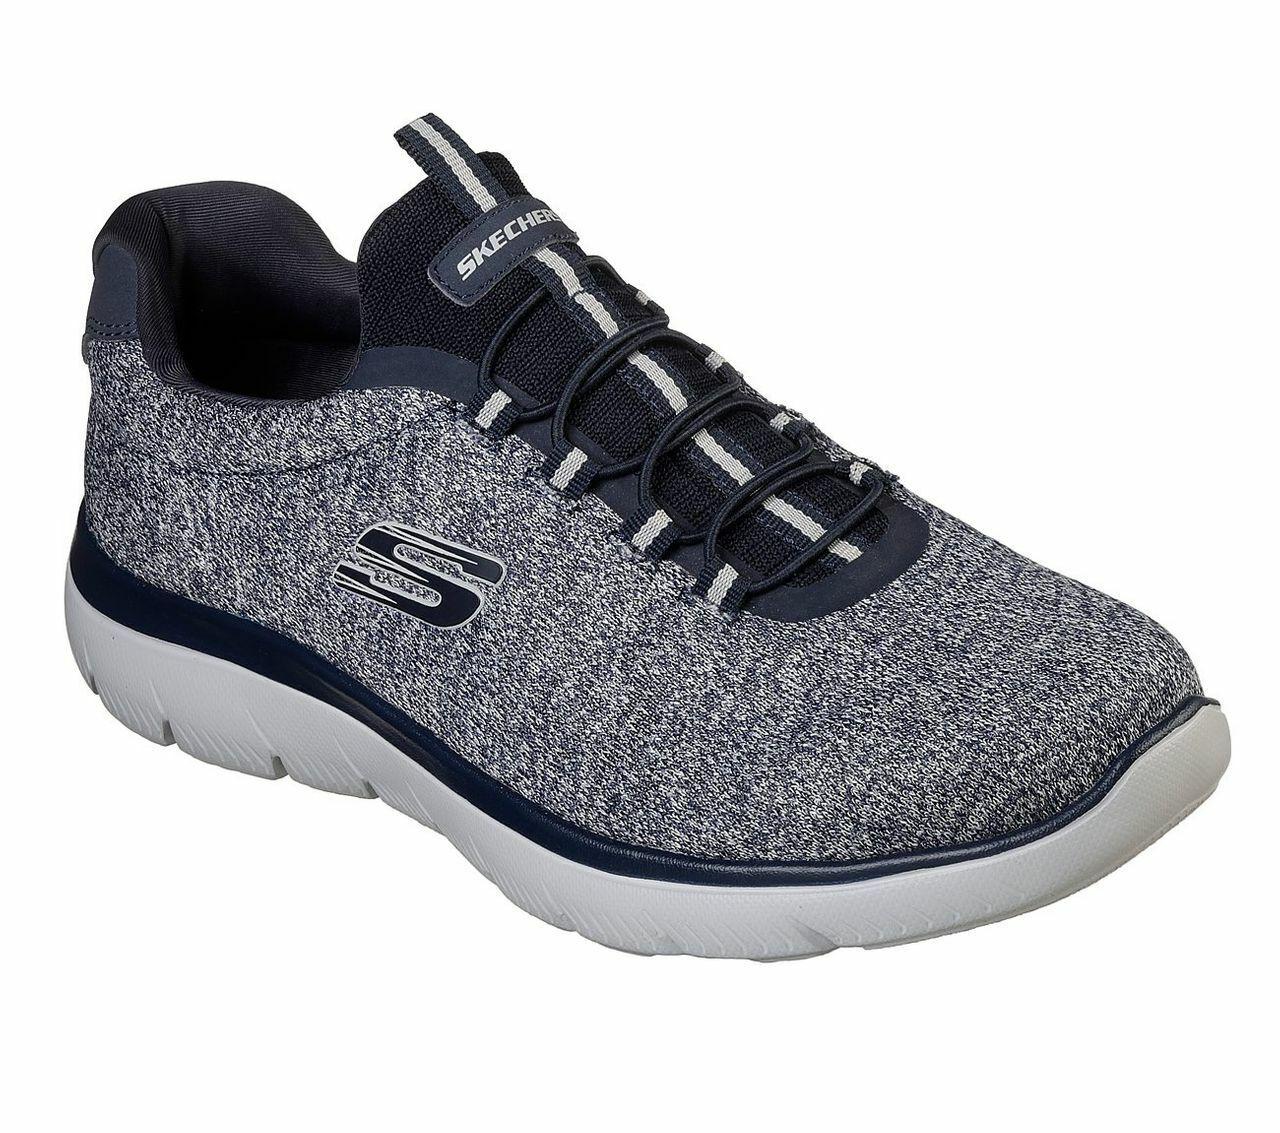 Skechers sport mens summits do zapatos azul man